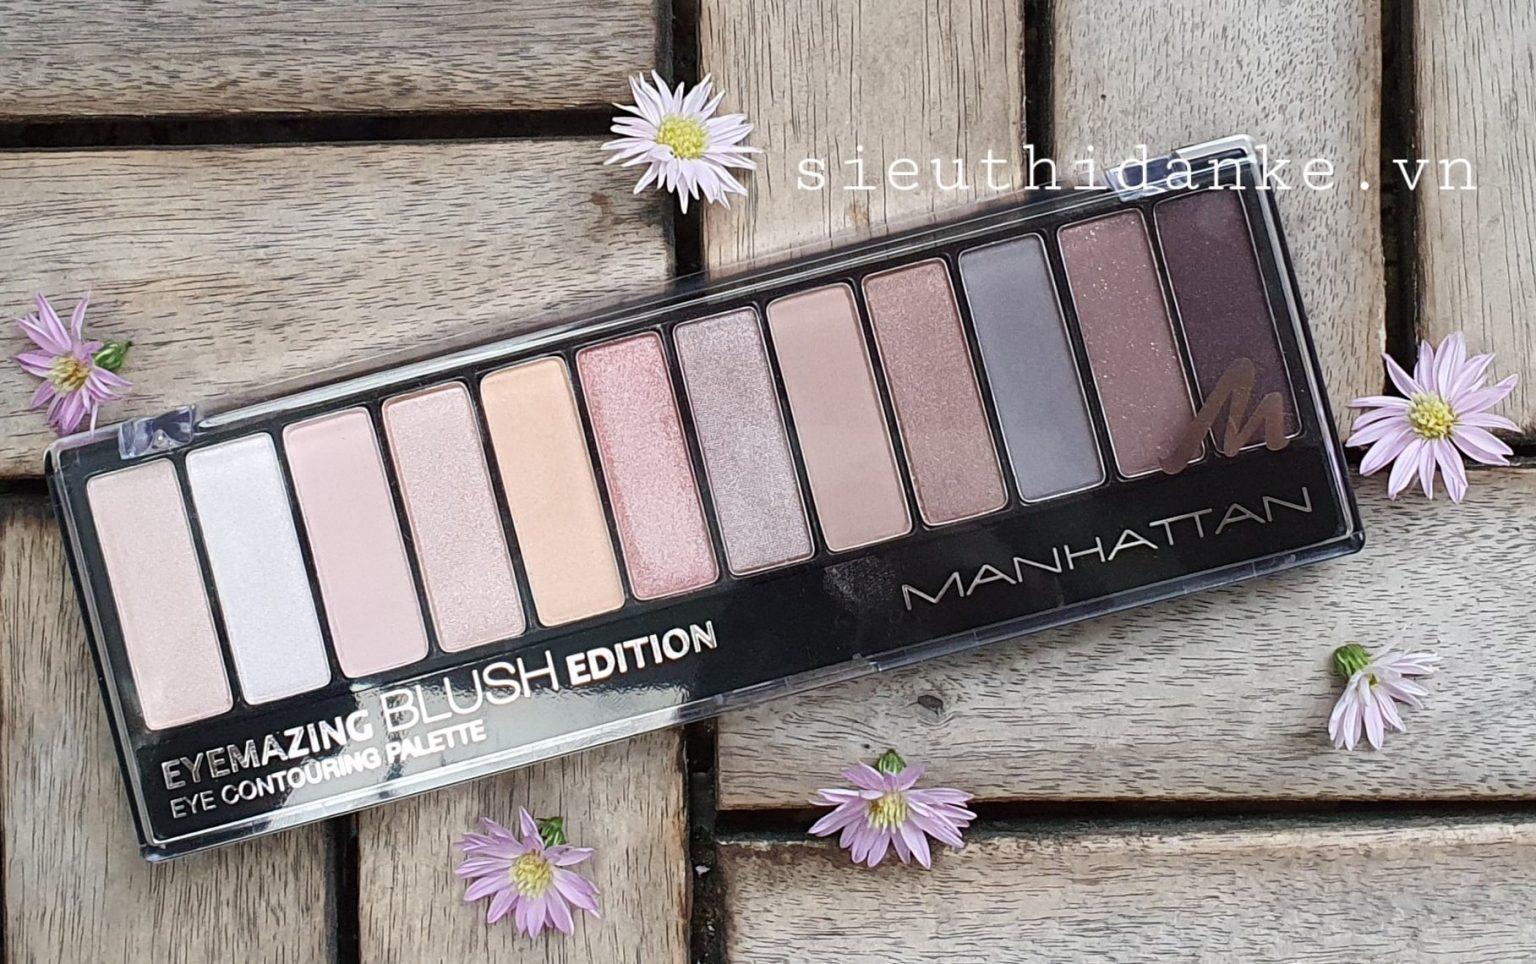 Manhattan, Eyemazing Nudes, Eyeshadow Palette (Paleta 8